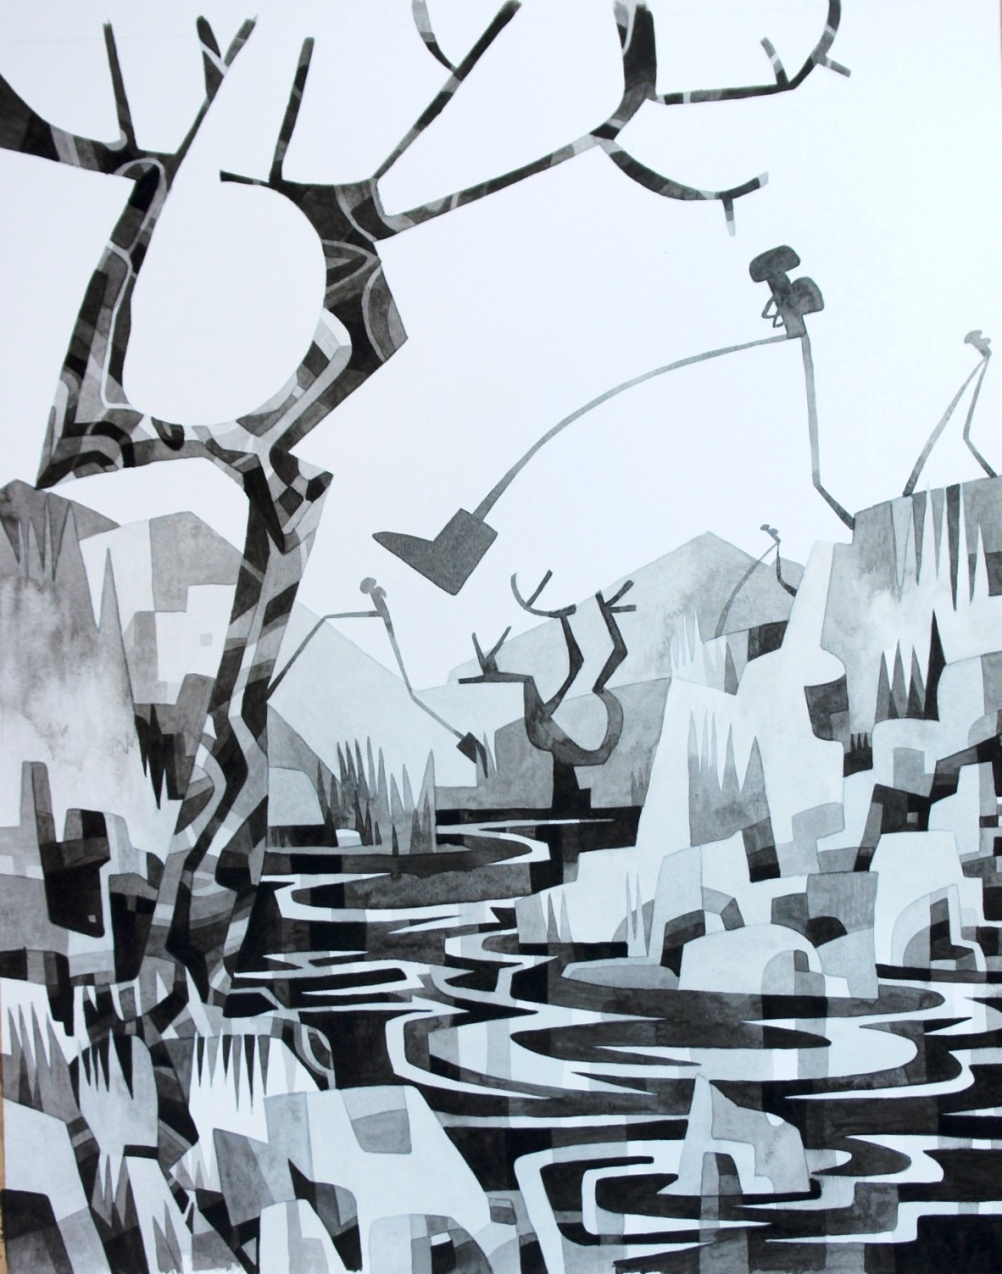 Wintery illustration